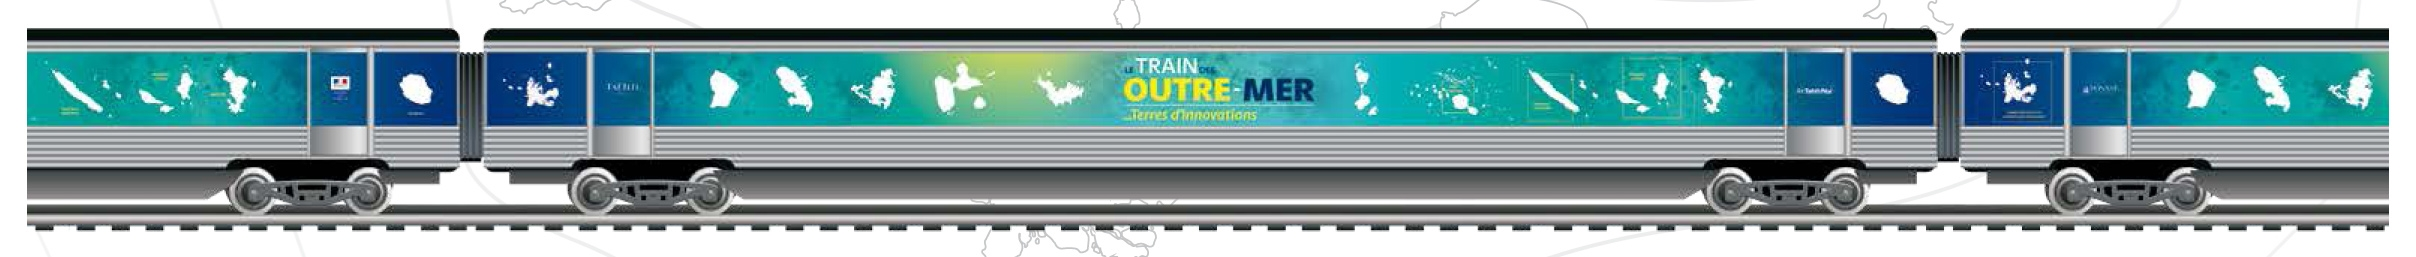 is_train_des_outre-mer-2.jpg